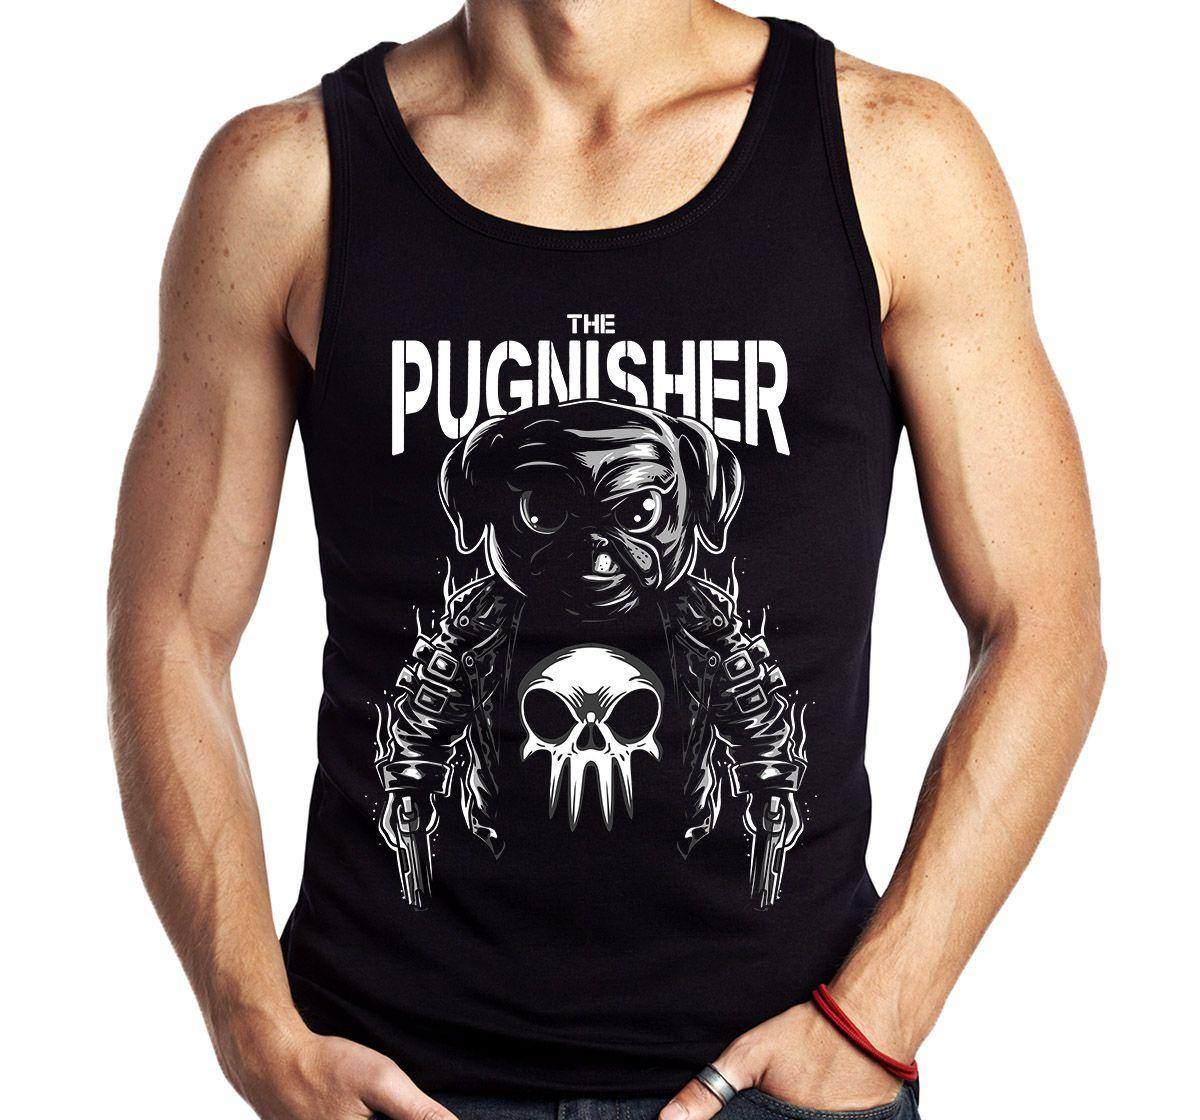 Camiseta Regata Geek Pugnisher Pug justiceiro Parodia   - Dragon Store